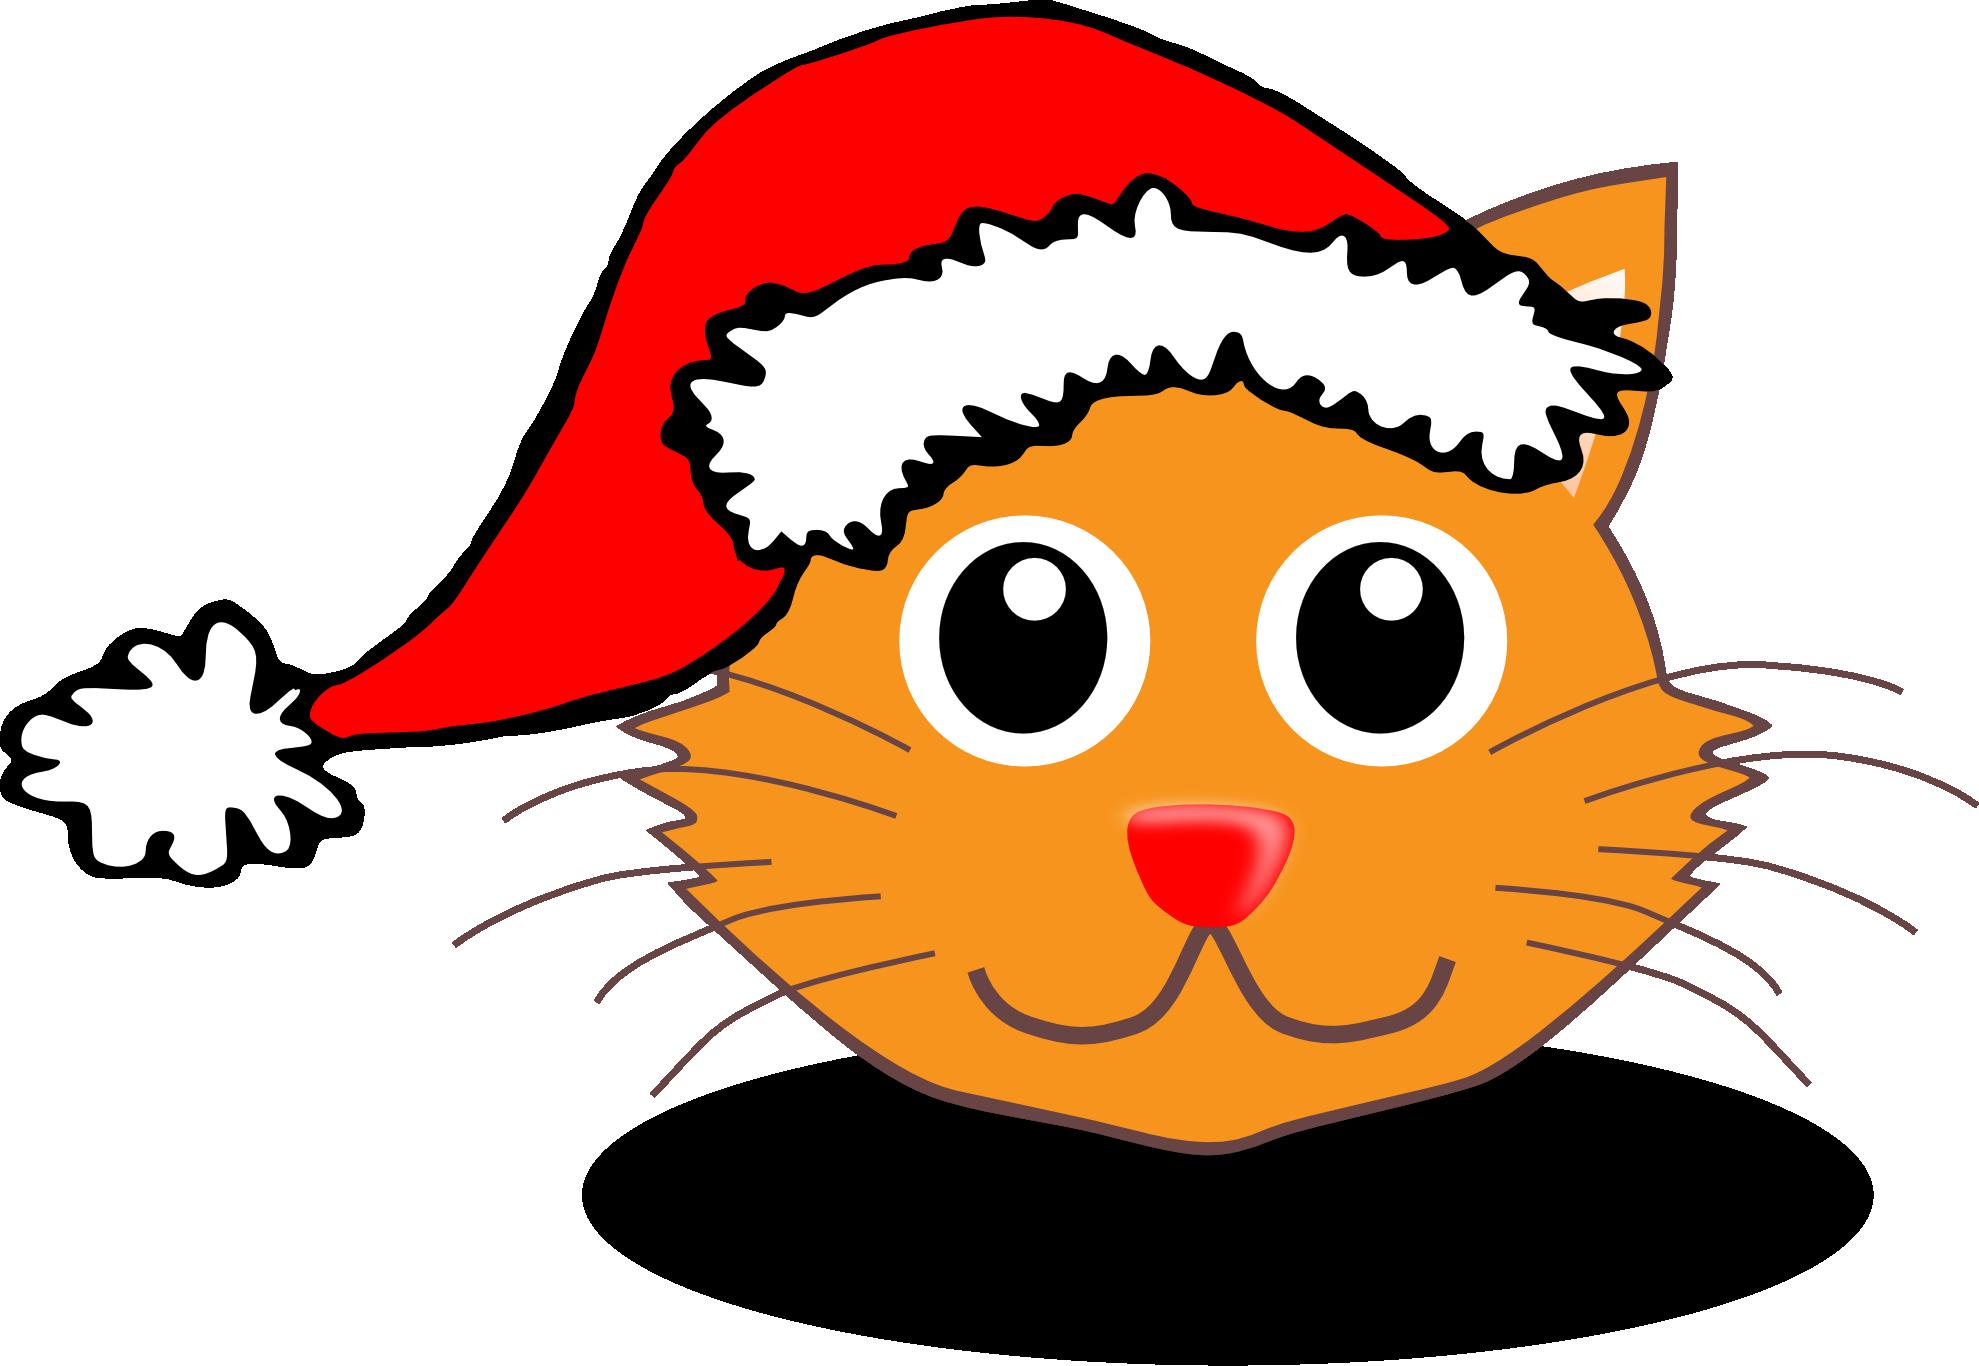 Clipart reindeer santa hat. Free cartoon christmas download